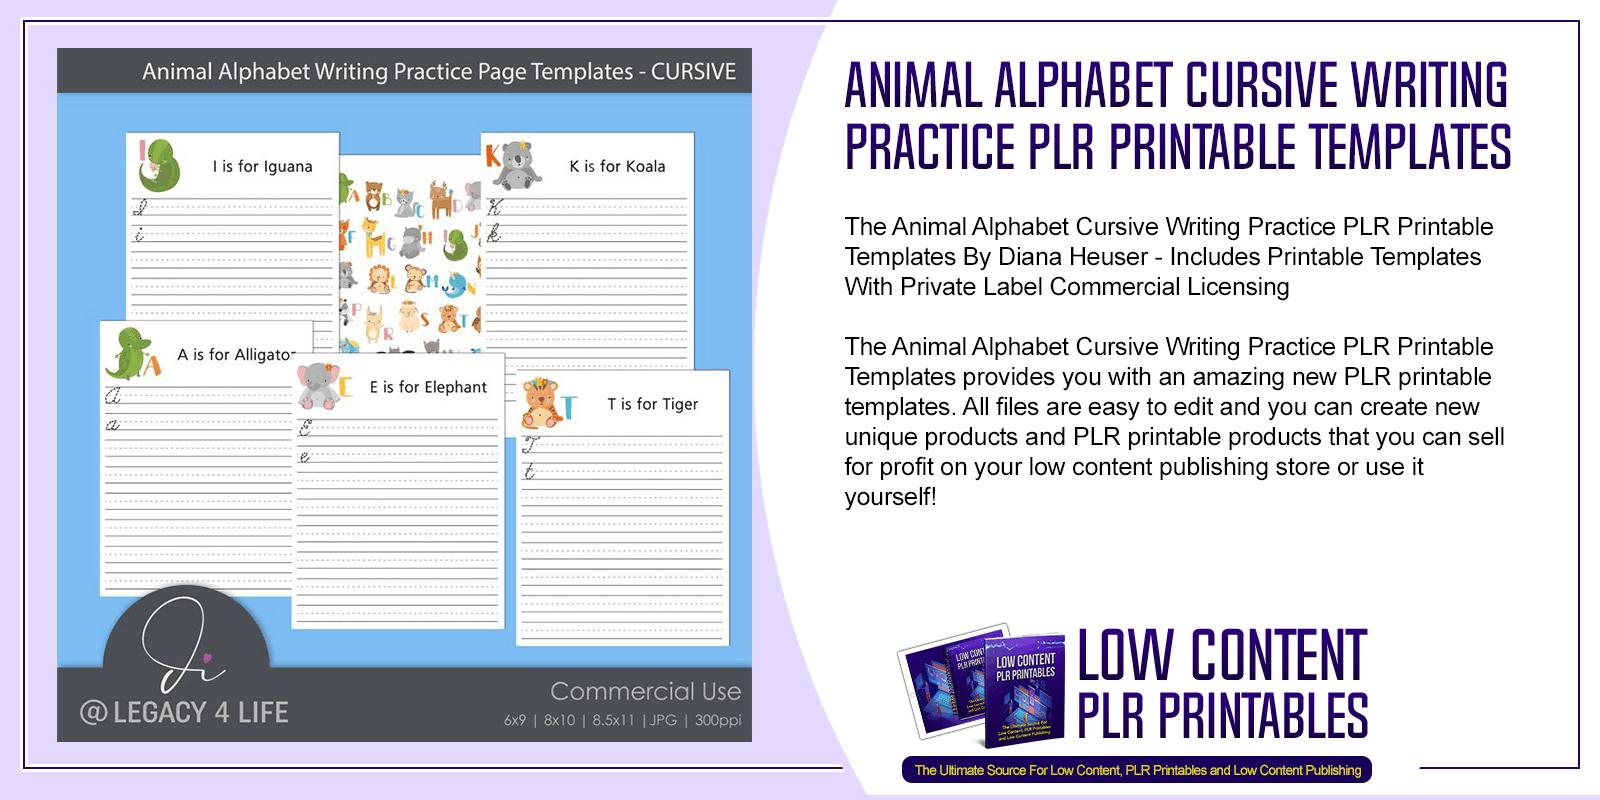 Animal Alphabet Cursive Writing Practice PLR Printable Templates